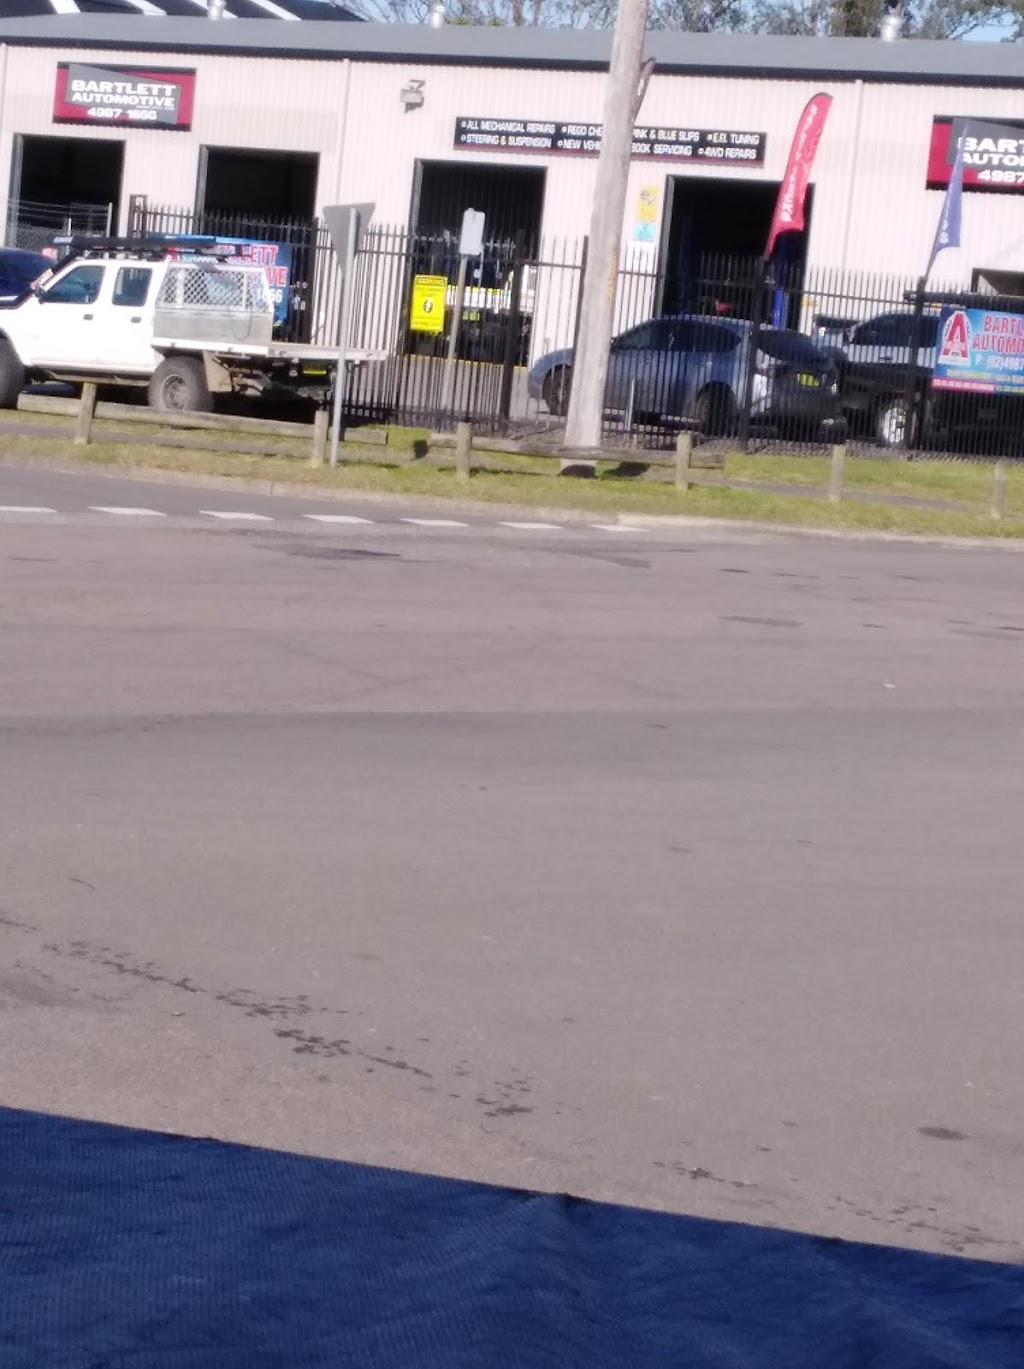 Bartlett Automotive aust Pty Ltd Raymond Terrace | car repair | 13 Kangaroo St, Raymond Terrace NSW 2324, Australia | 0249871666 OR +61 2 4987 1666